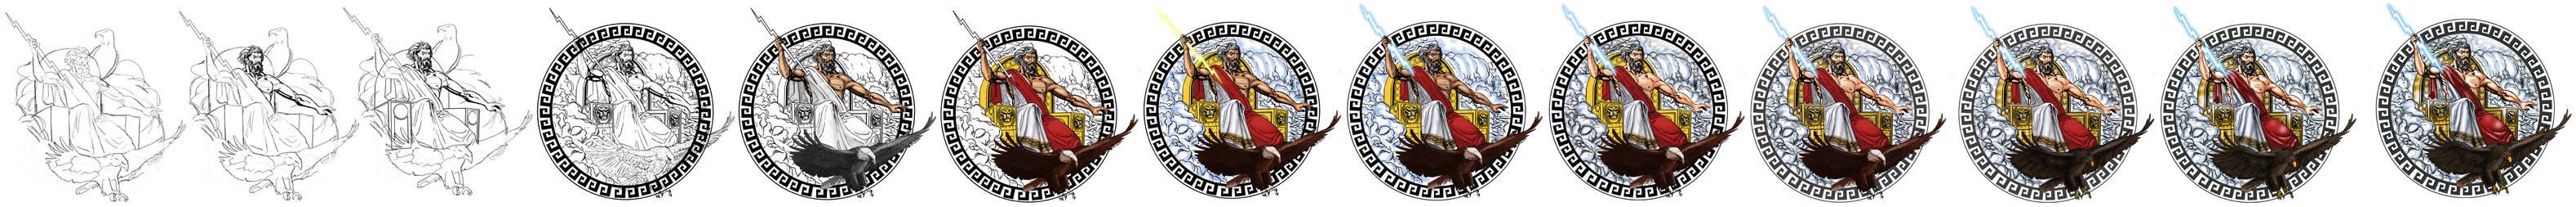 Mighty Zeus tattoo progress